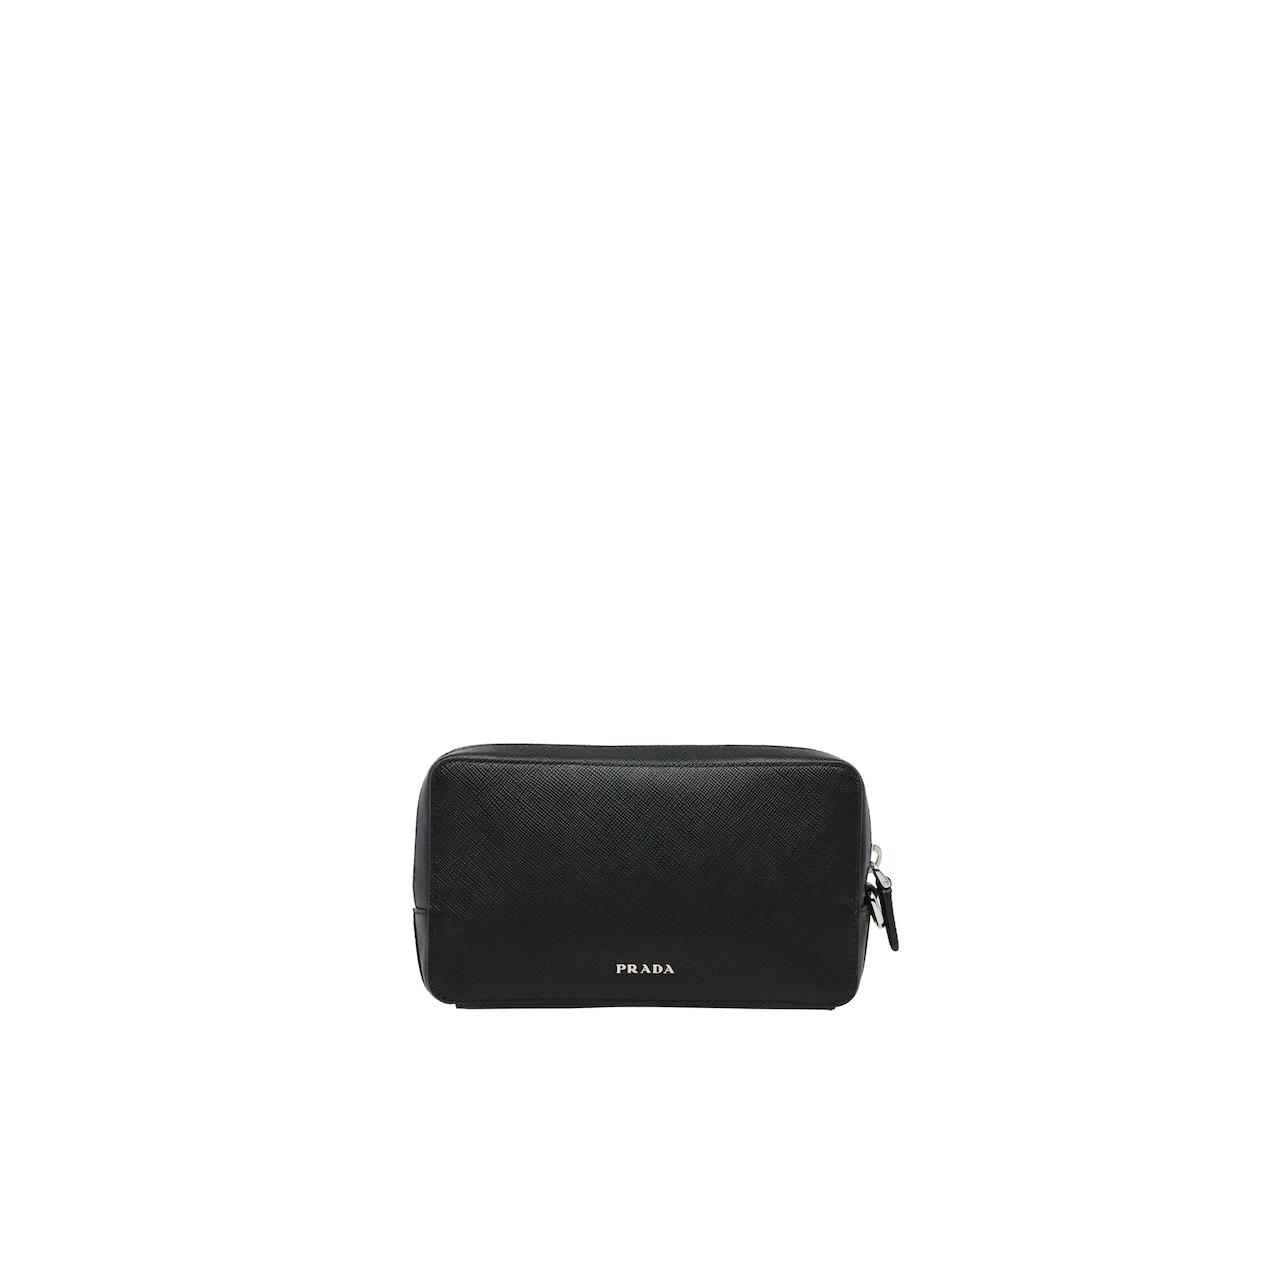 Prada Leather cellphone case 1